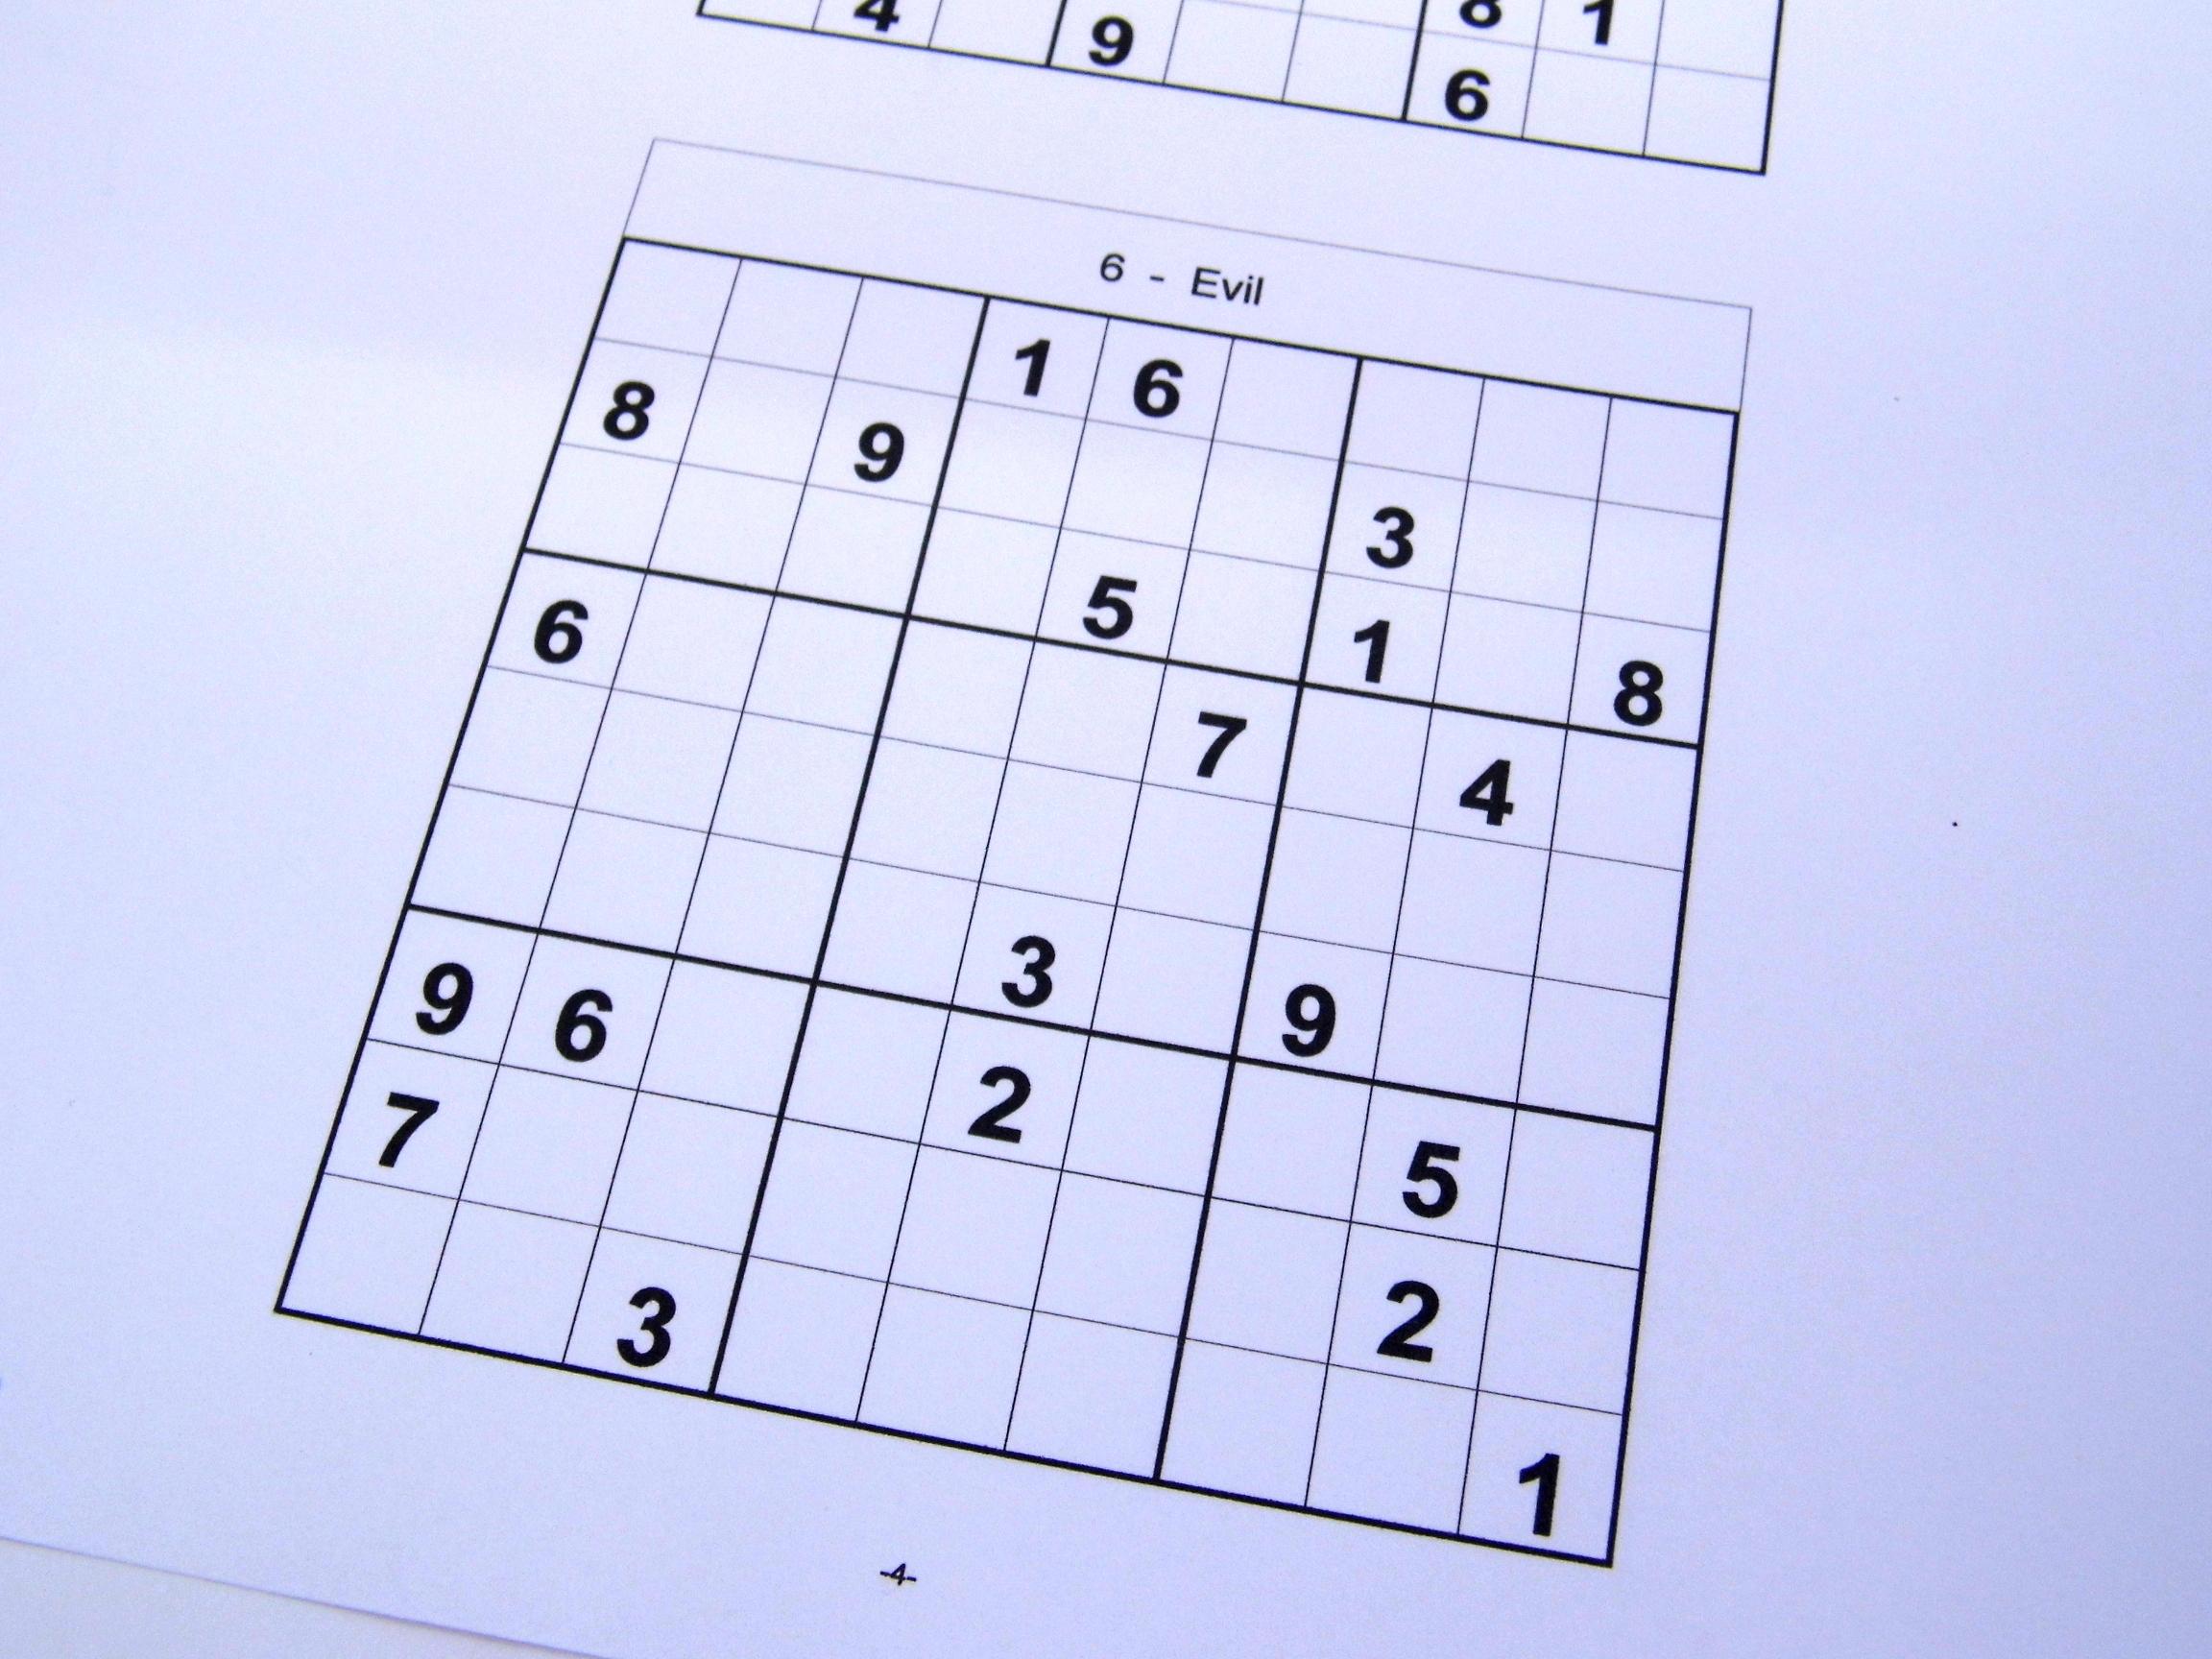 Evil Printable Sudoku Puzzles 6 Per Page – Book 12 – Free